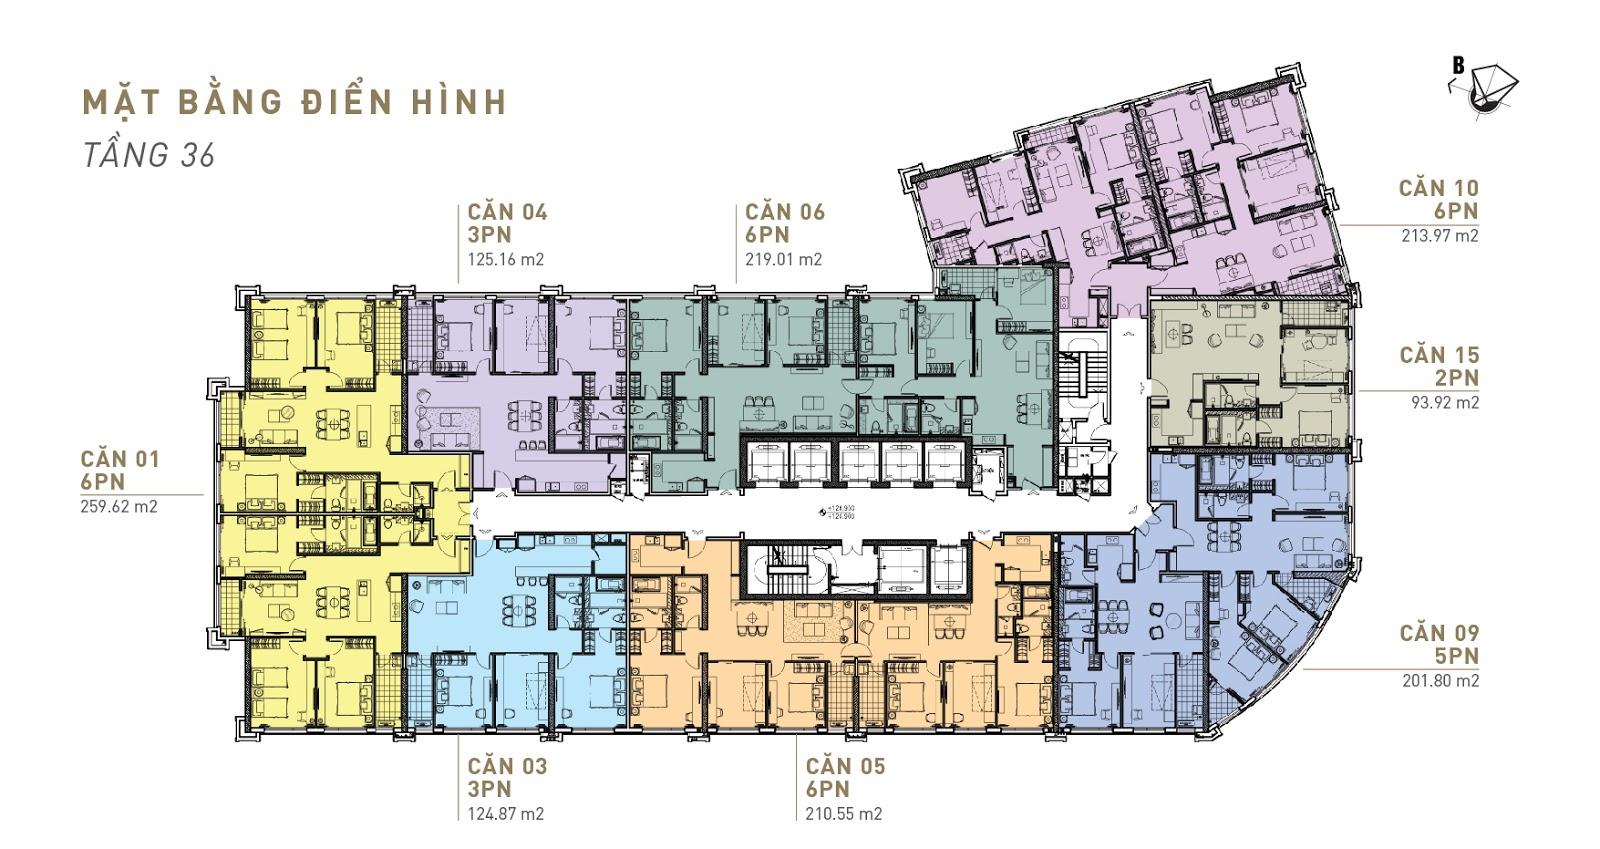 Mặt bằng tầng 36 King Palace